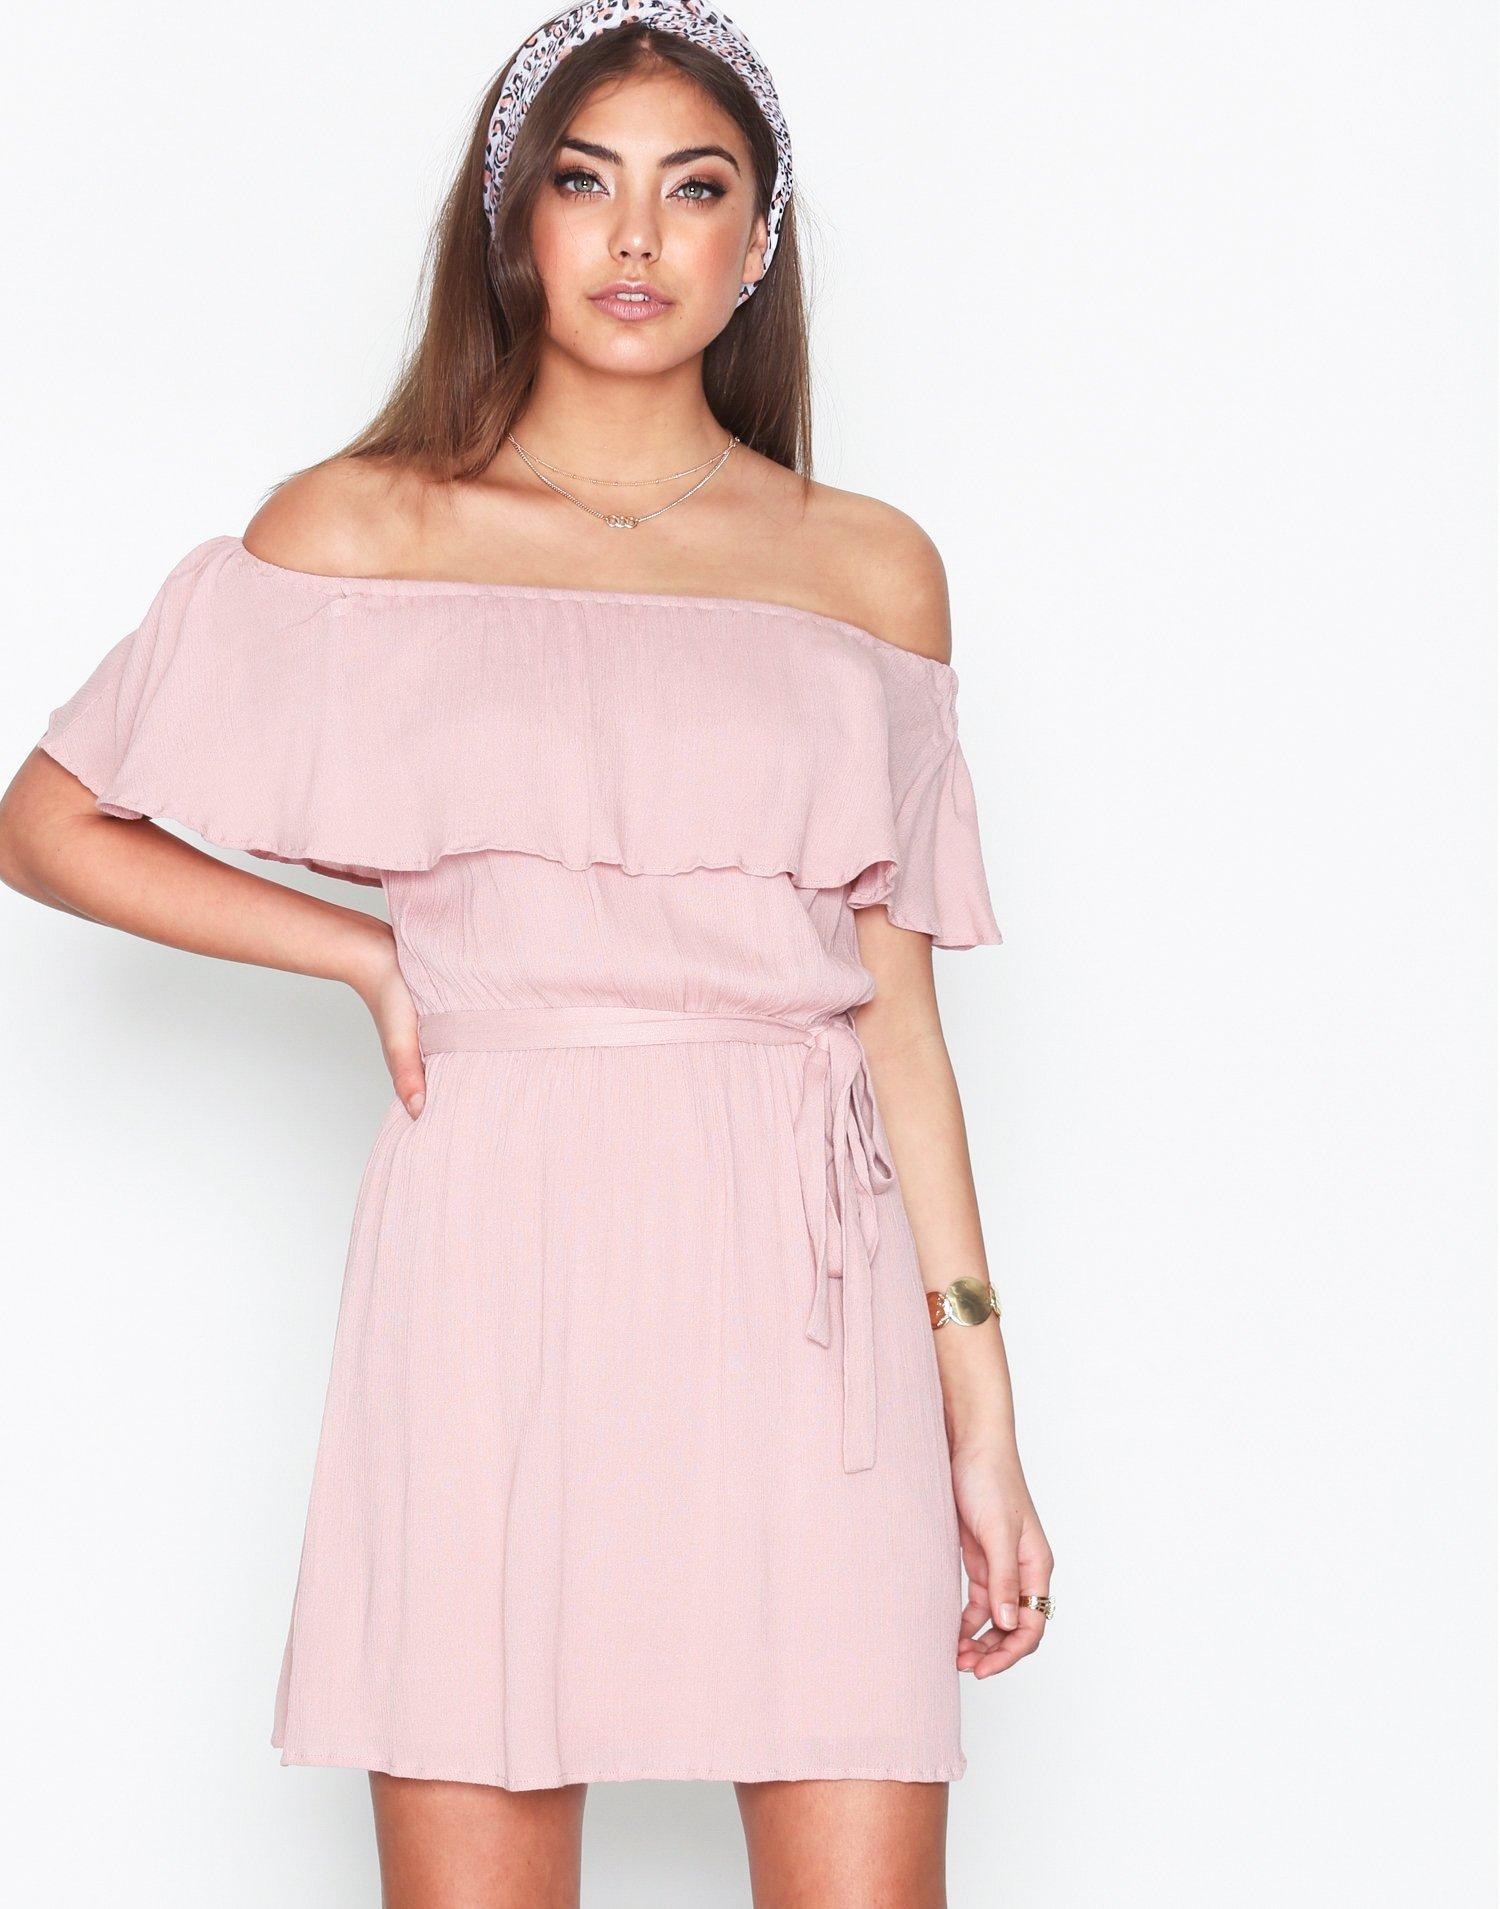 Singoalla Short Dress by Nly Trend